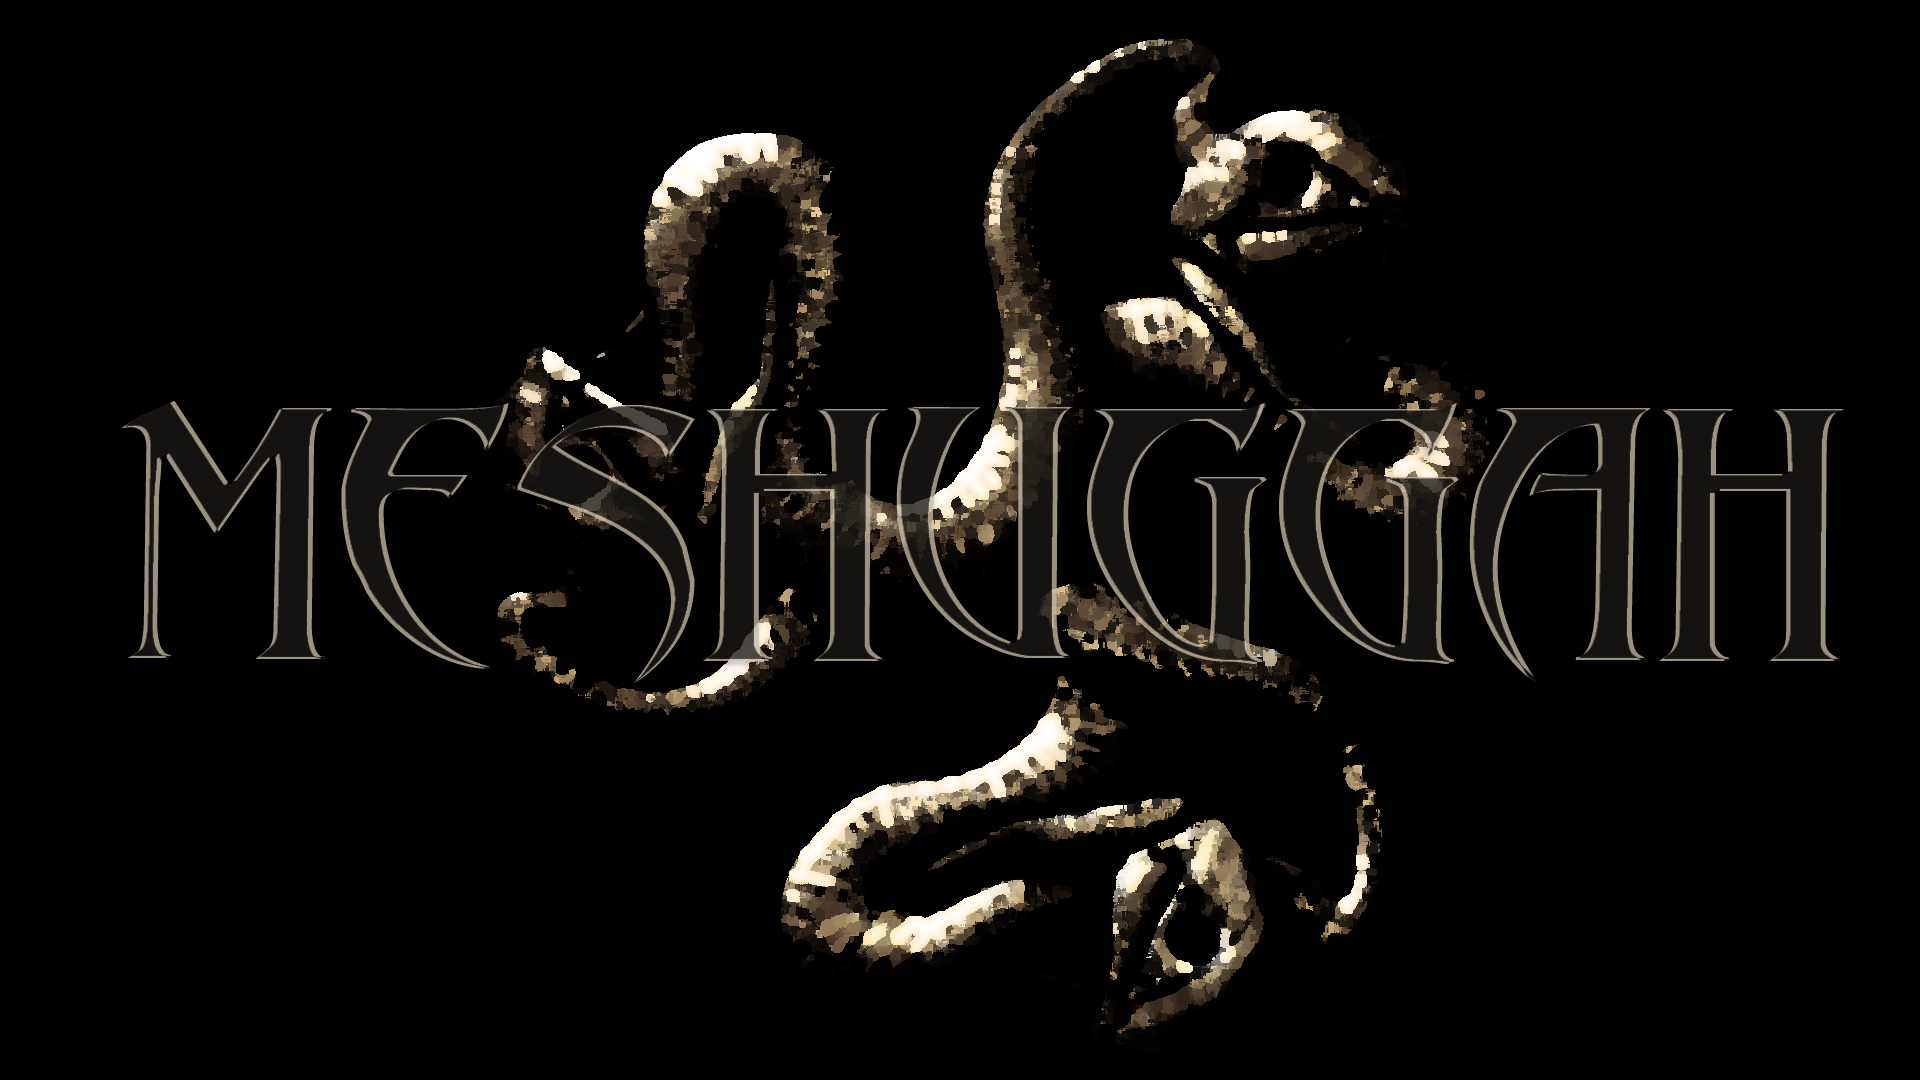 Meshuggah by gregkwaste on deviantART 1920x1080